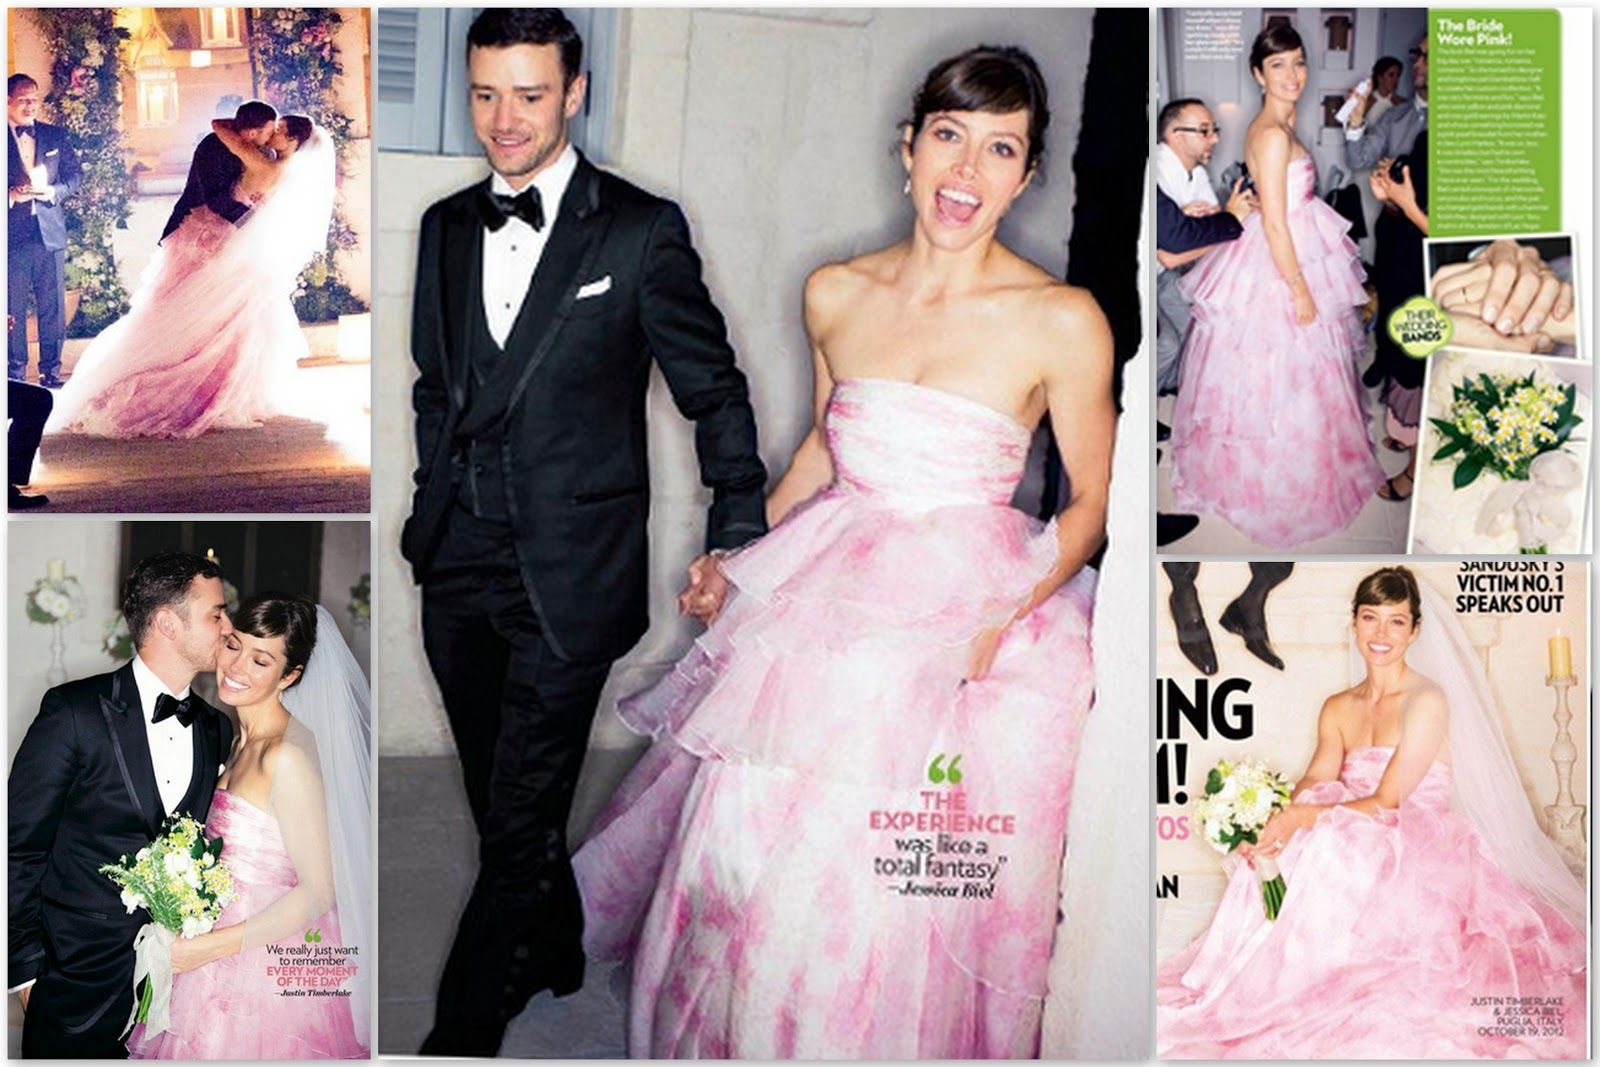 Jlo wedding dress  wedding biel  Wedding inspiration  Pinterest  Wedding Wedding